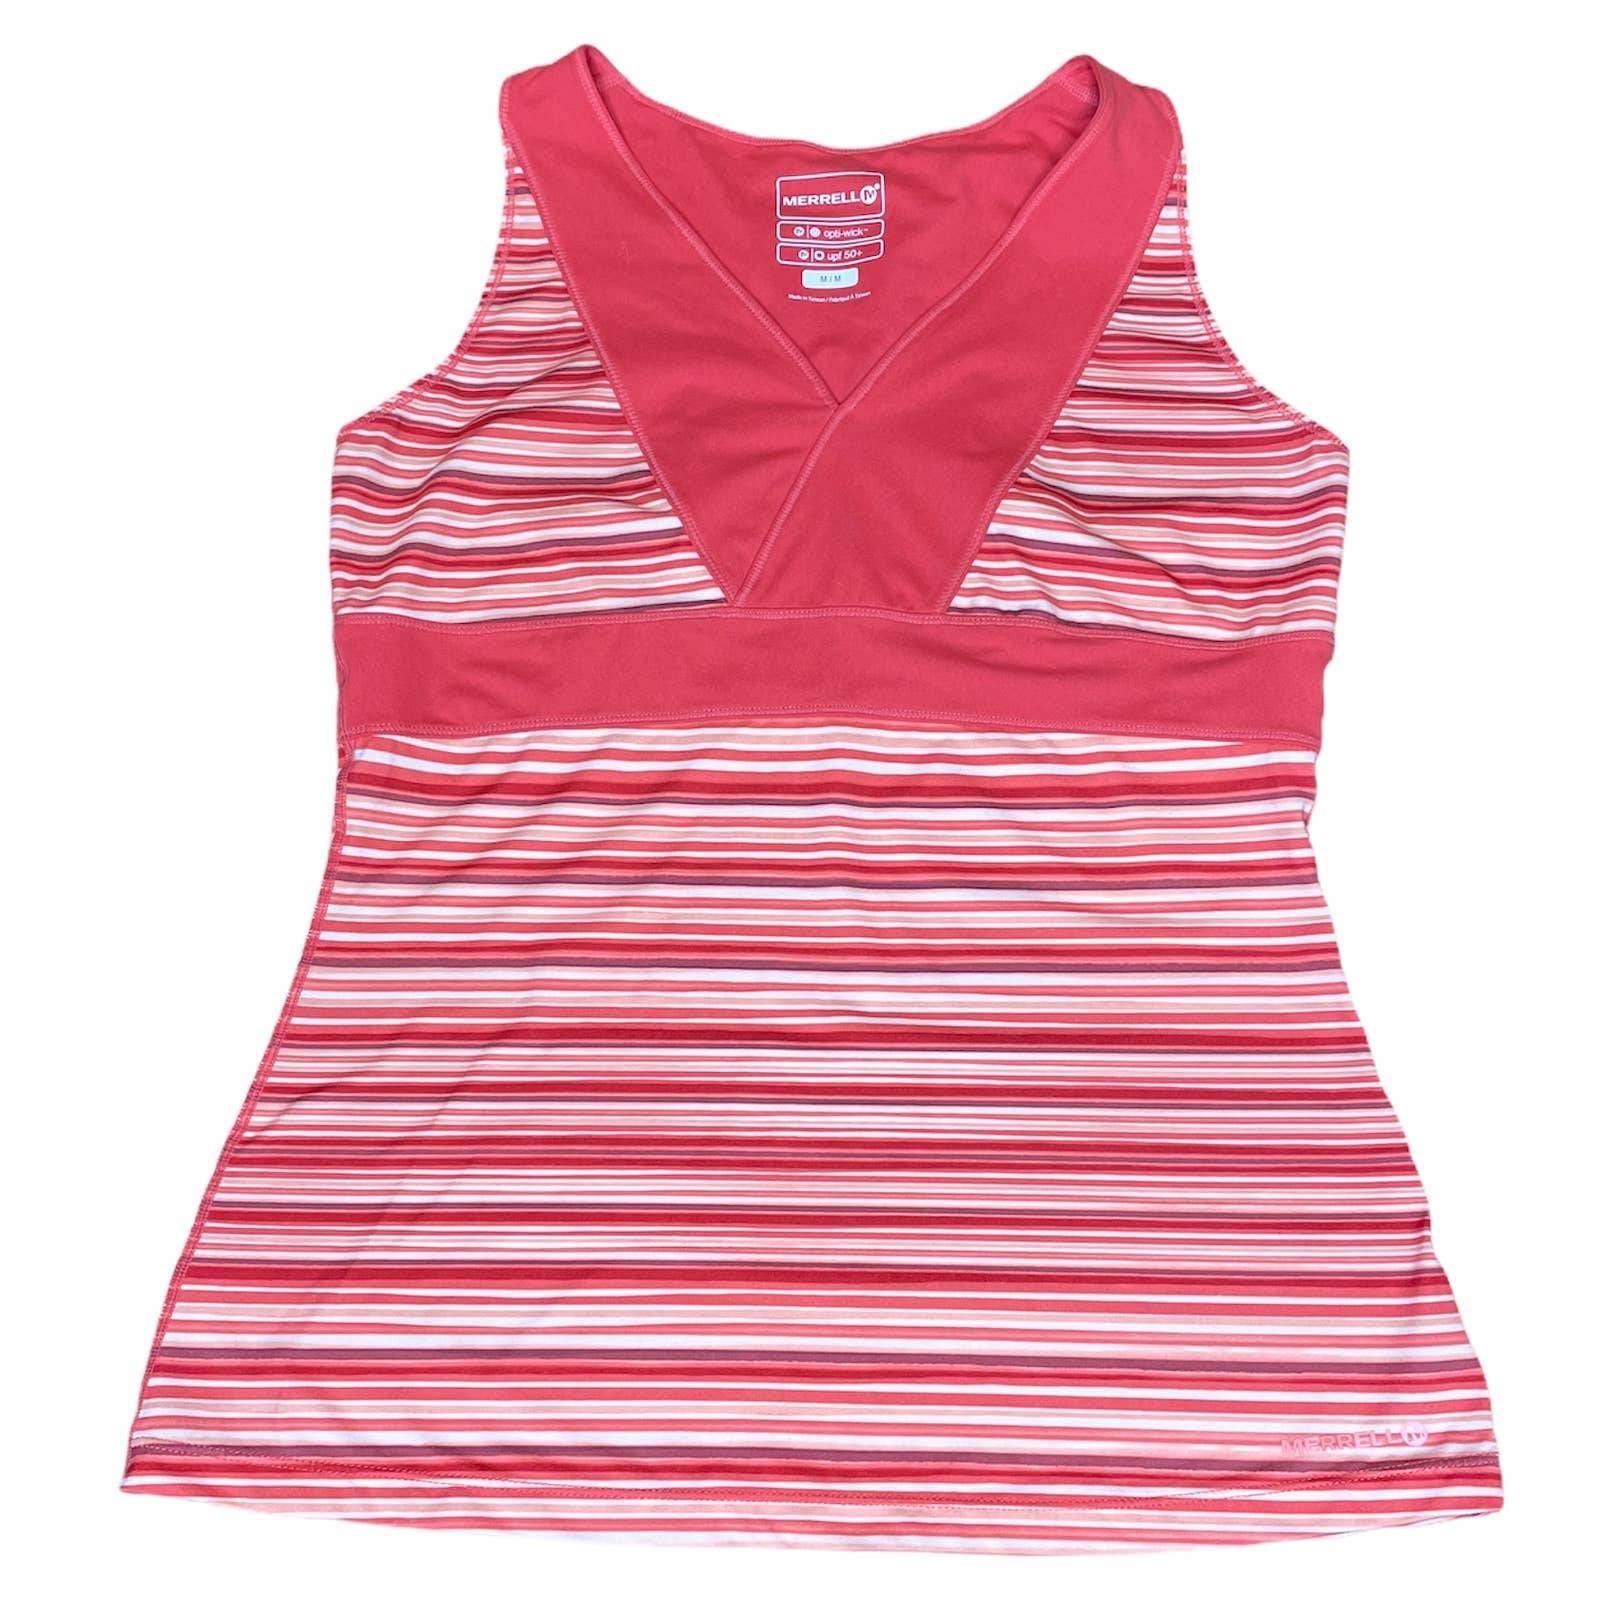 Merrell Striped Yoga Top Size Medium